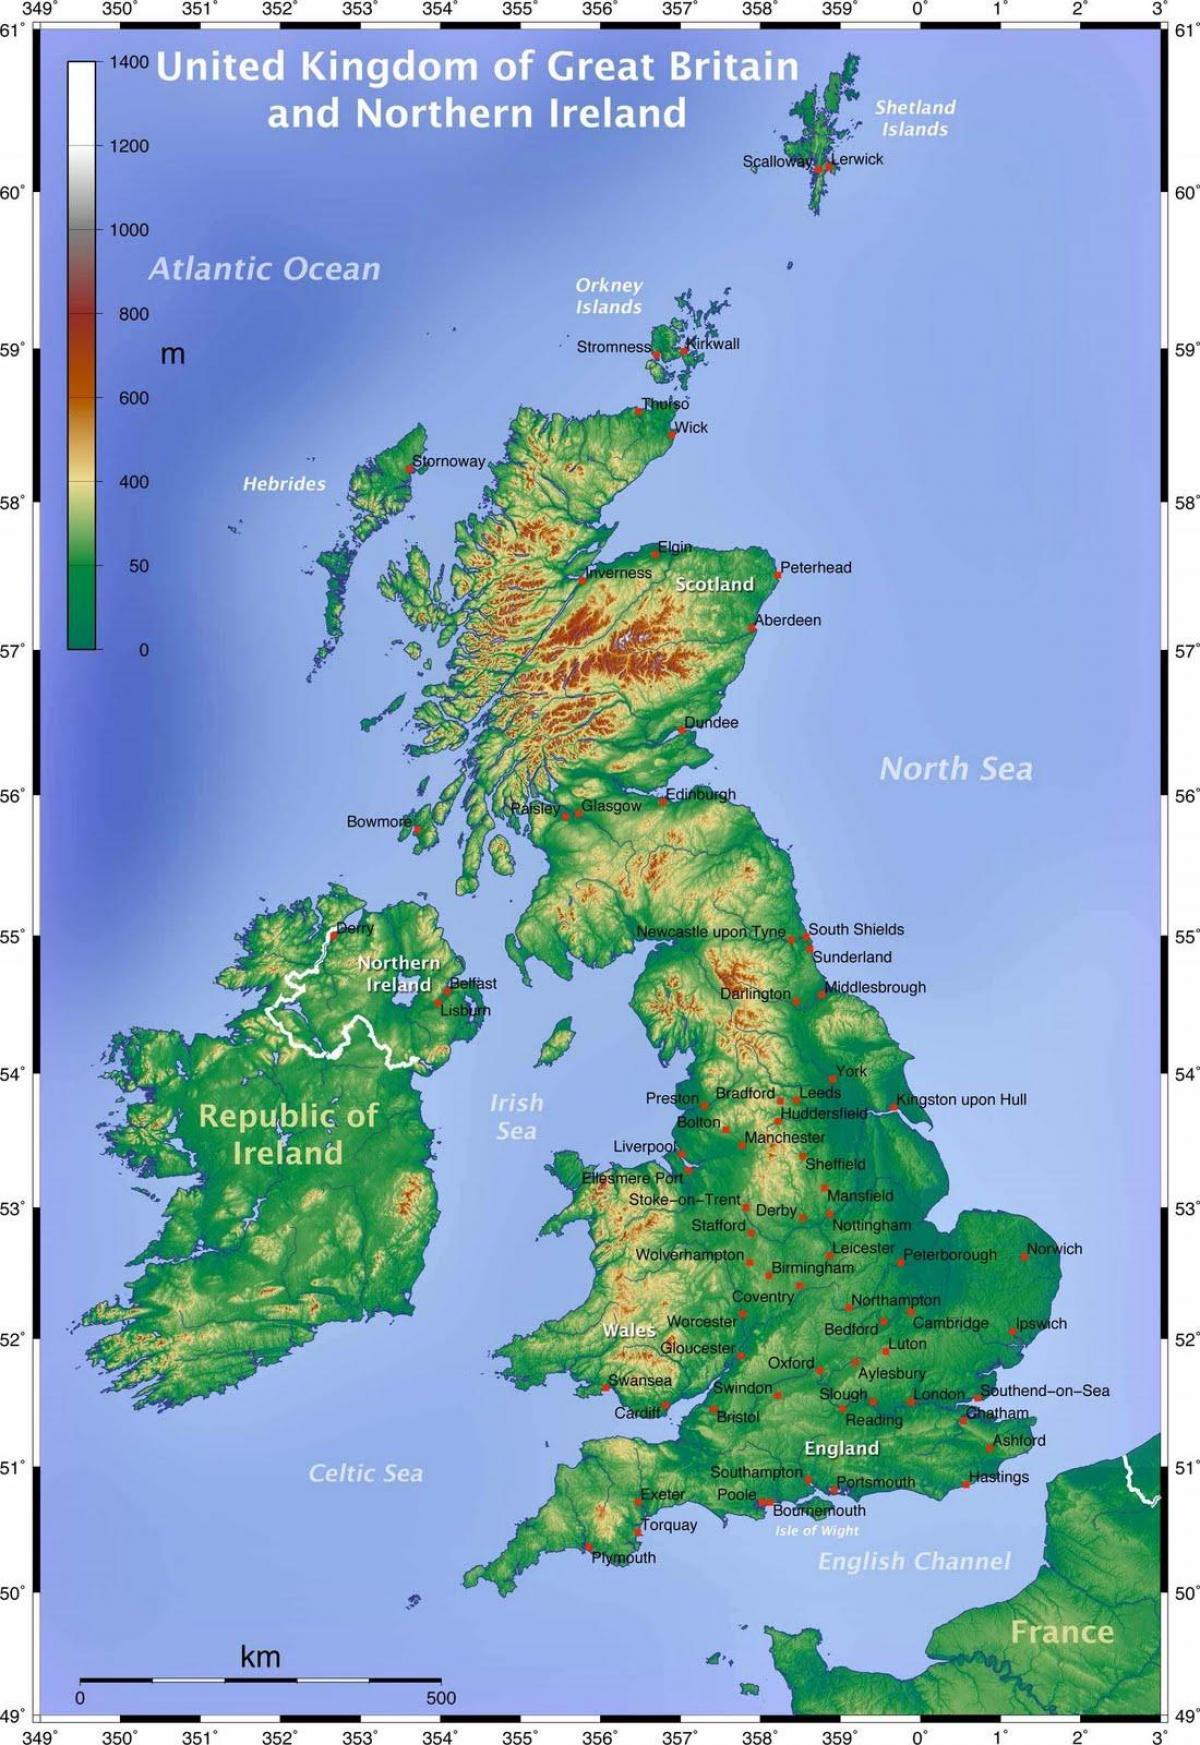 La Cartina Geografica Della Gran Bretagna.Mappa Geografica Del Regno Unito Mappa Geografica Della Gran Bretagna Europa Del Nord Europa